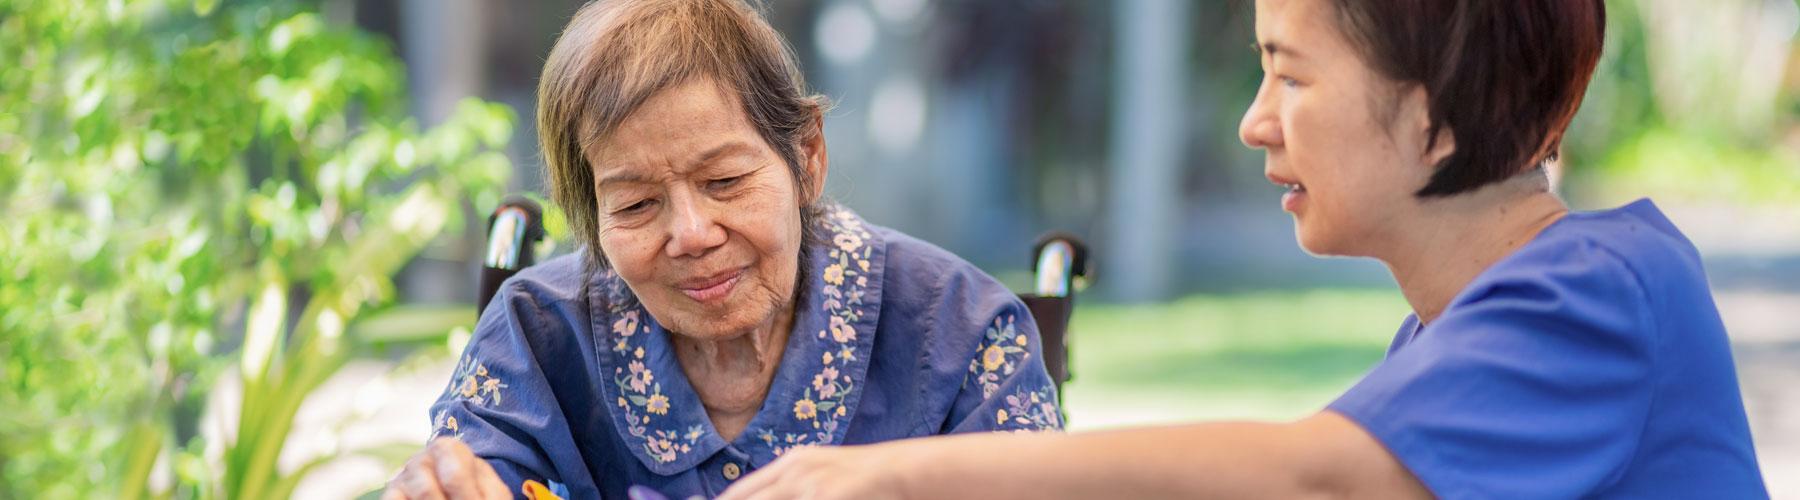 UConn Online Dementia Care Graduate Certificate Program